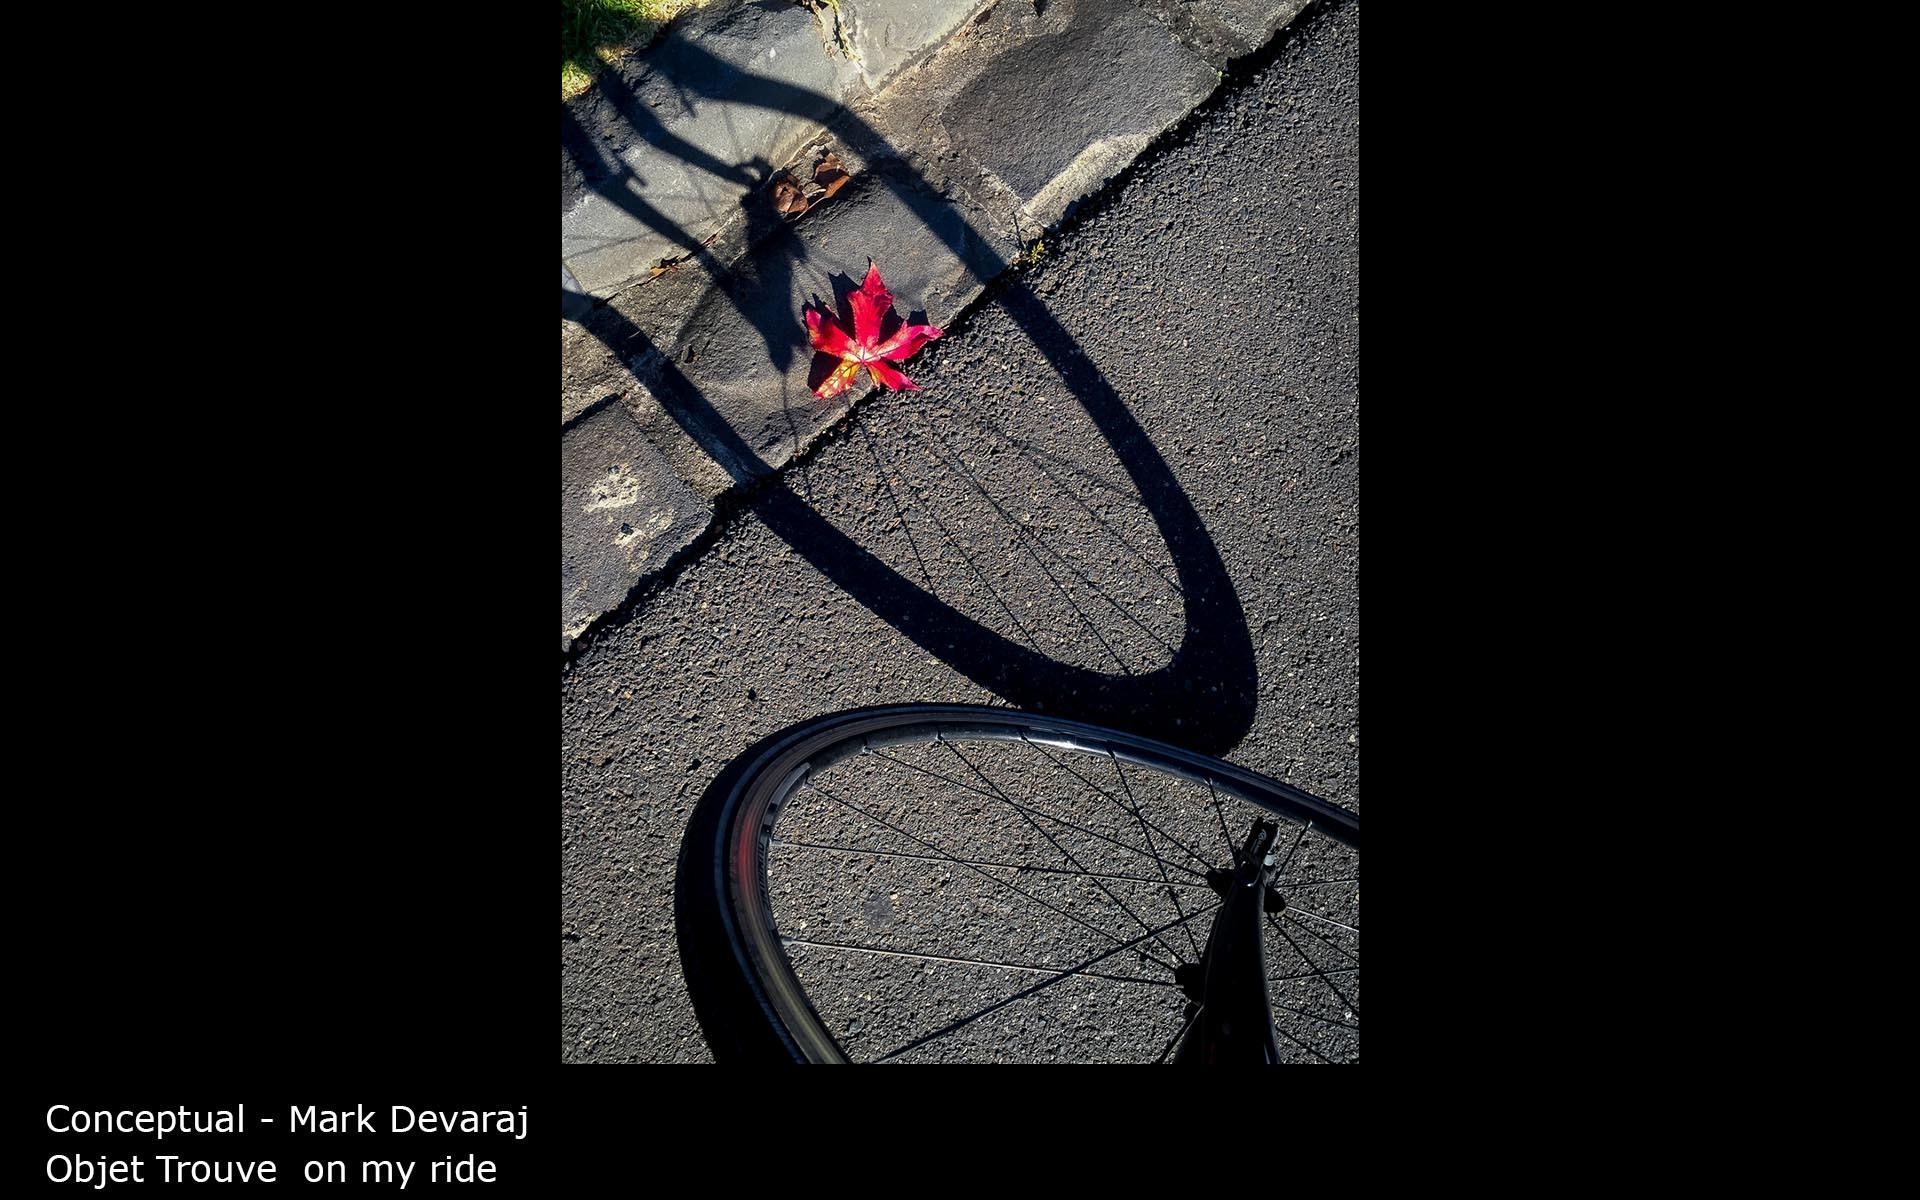 Objet Trouve  on my ride - Mark Devaraj